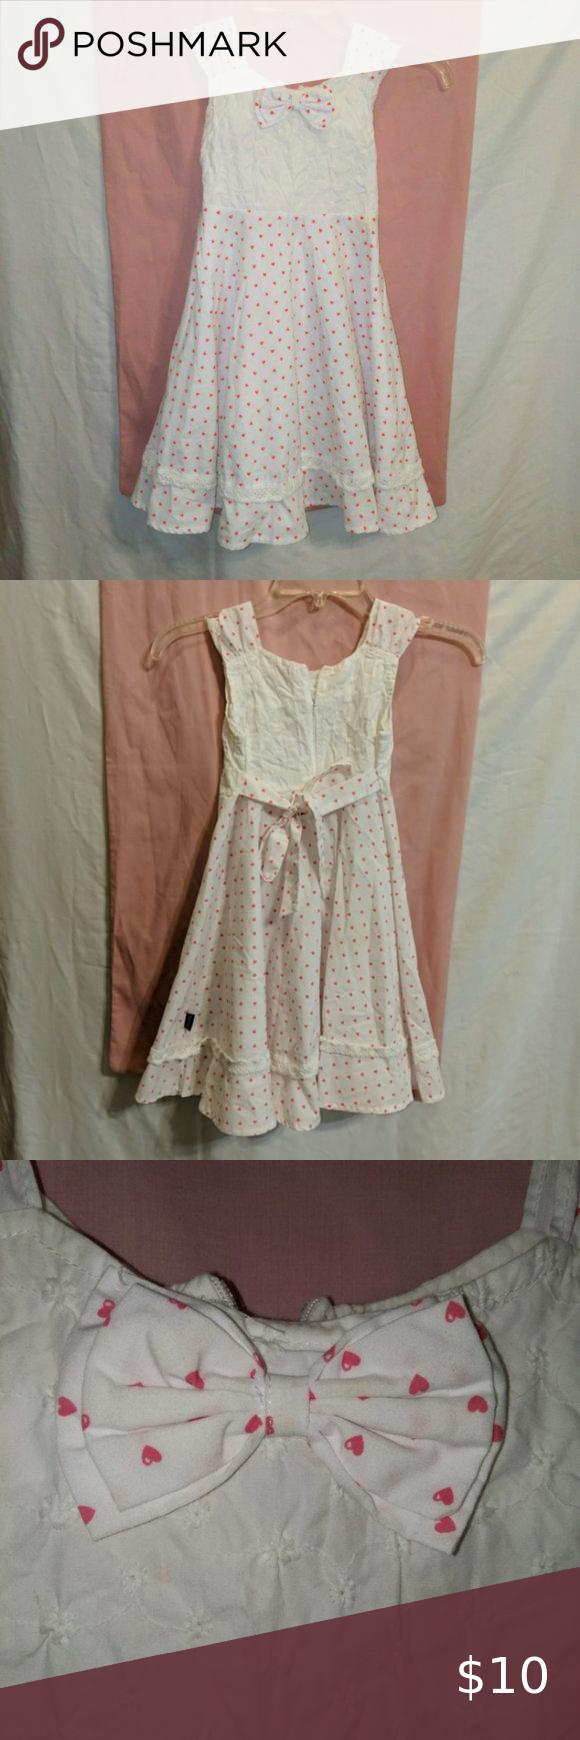 White Shalebao Dress Dresses Clothes Design Dress With Bow [ 1740 x 580 Pixel ]